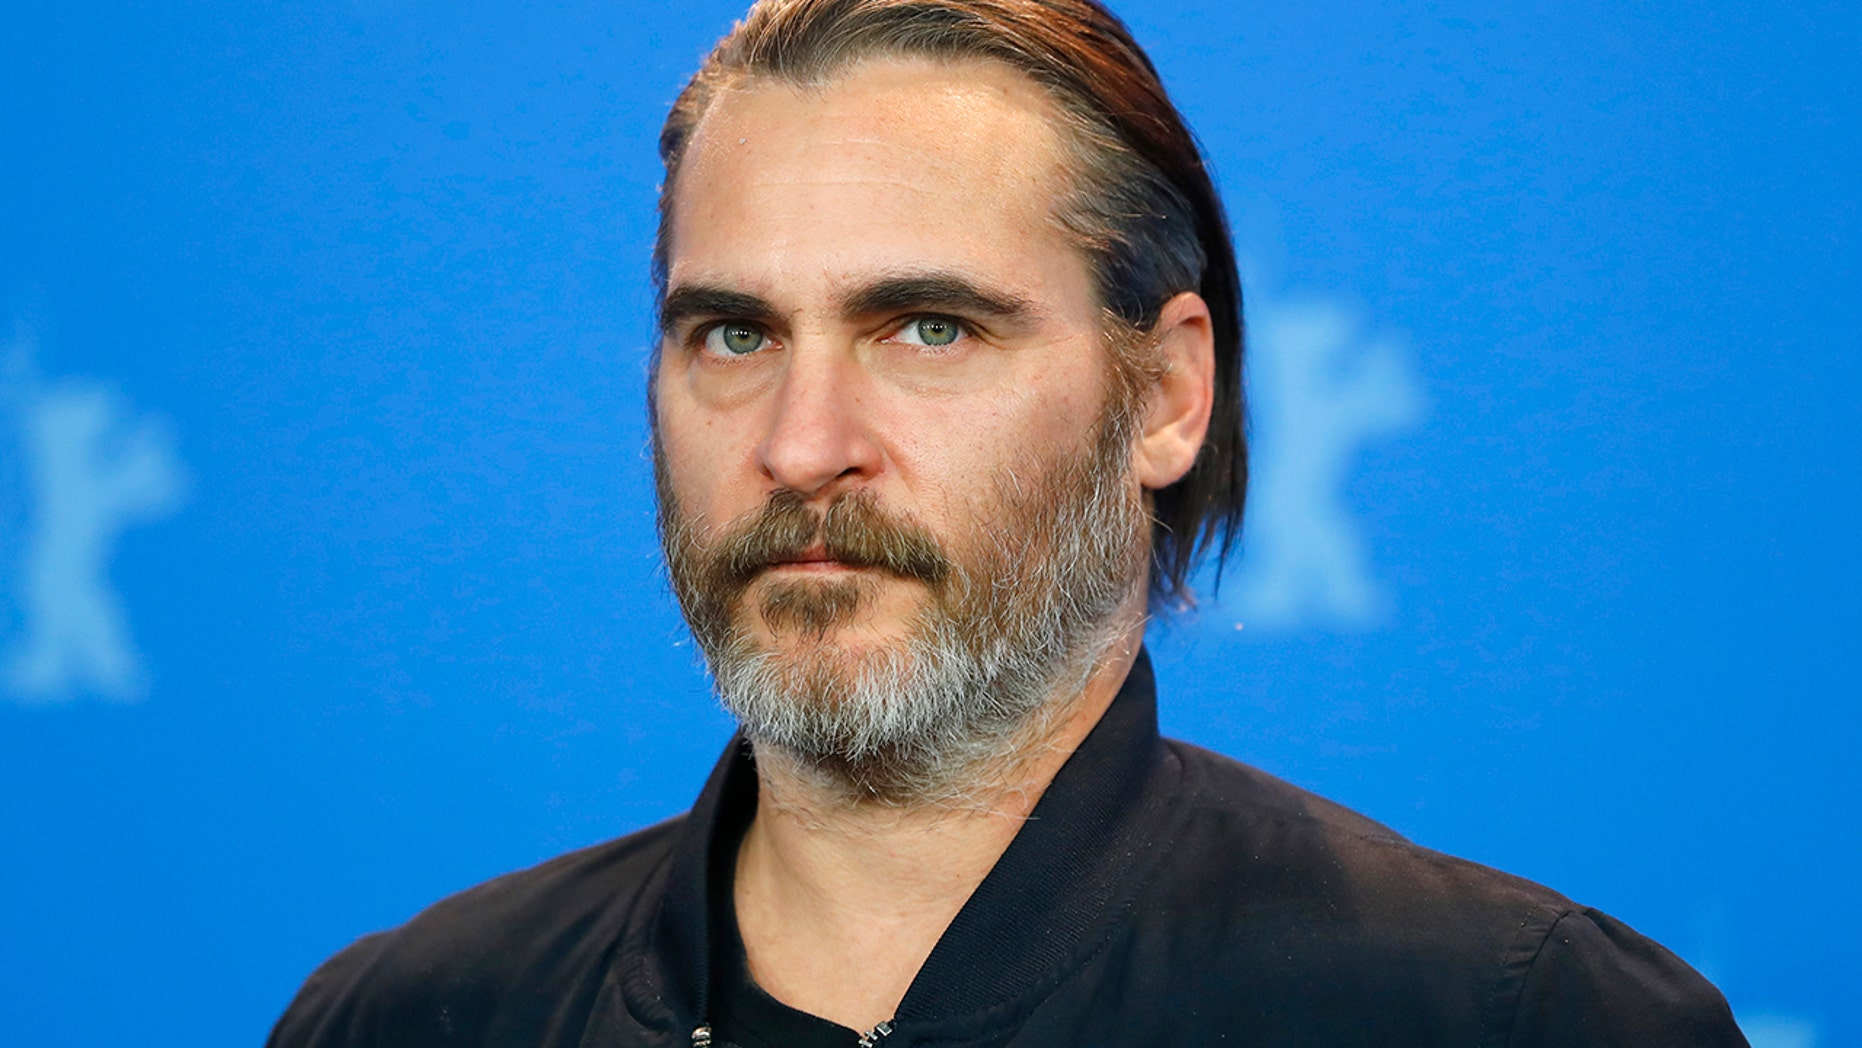 Joaquin Phoenix stars as Jesus in the new movie